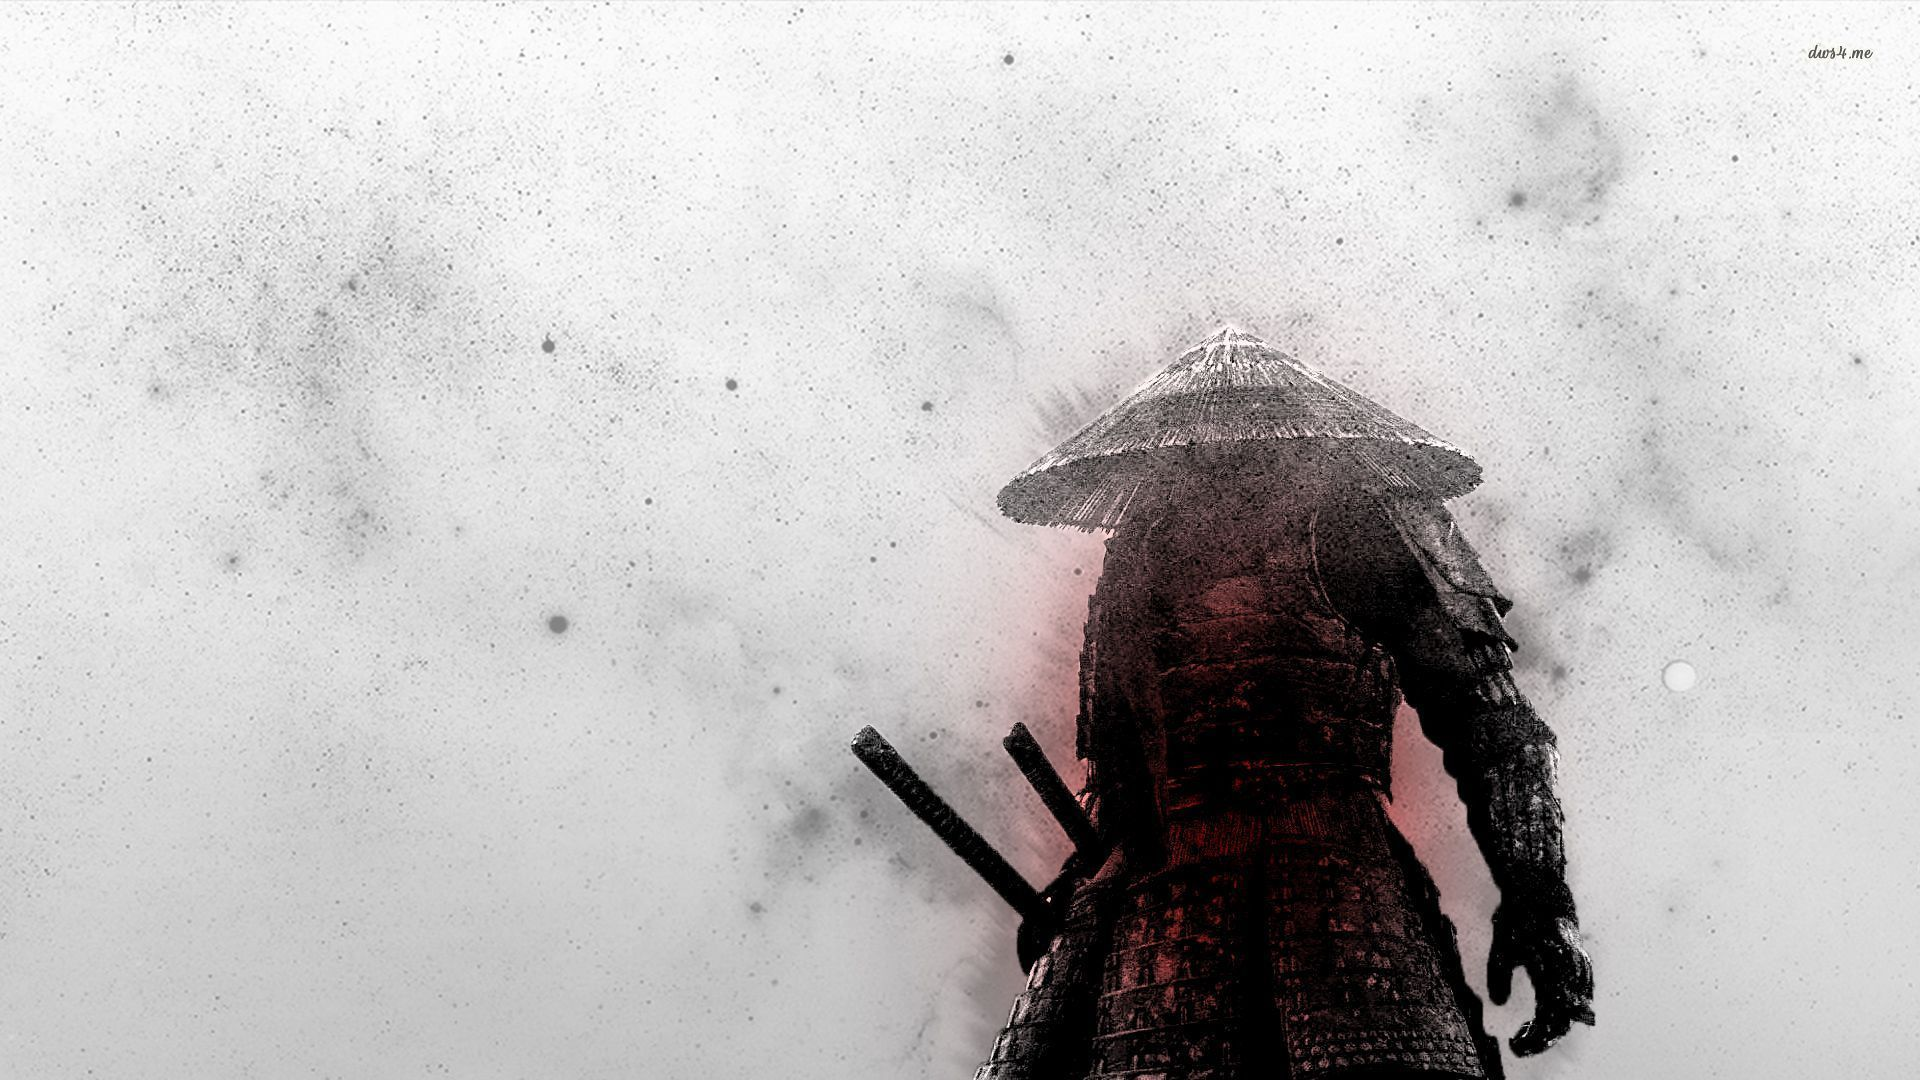 обои на пк самураи кажется, для меня